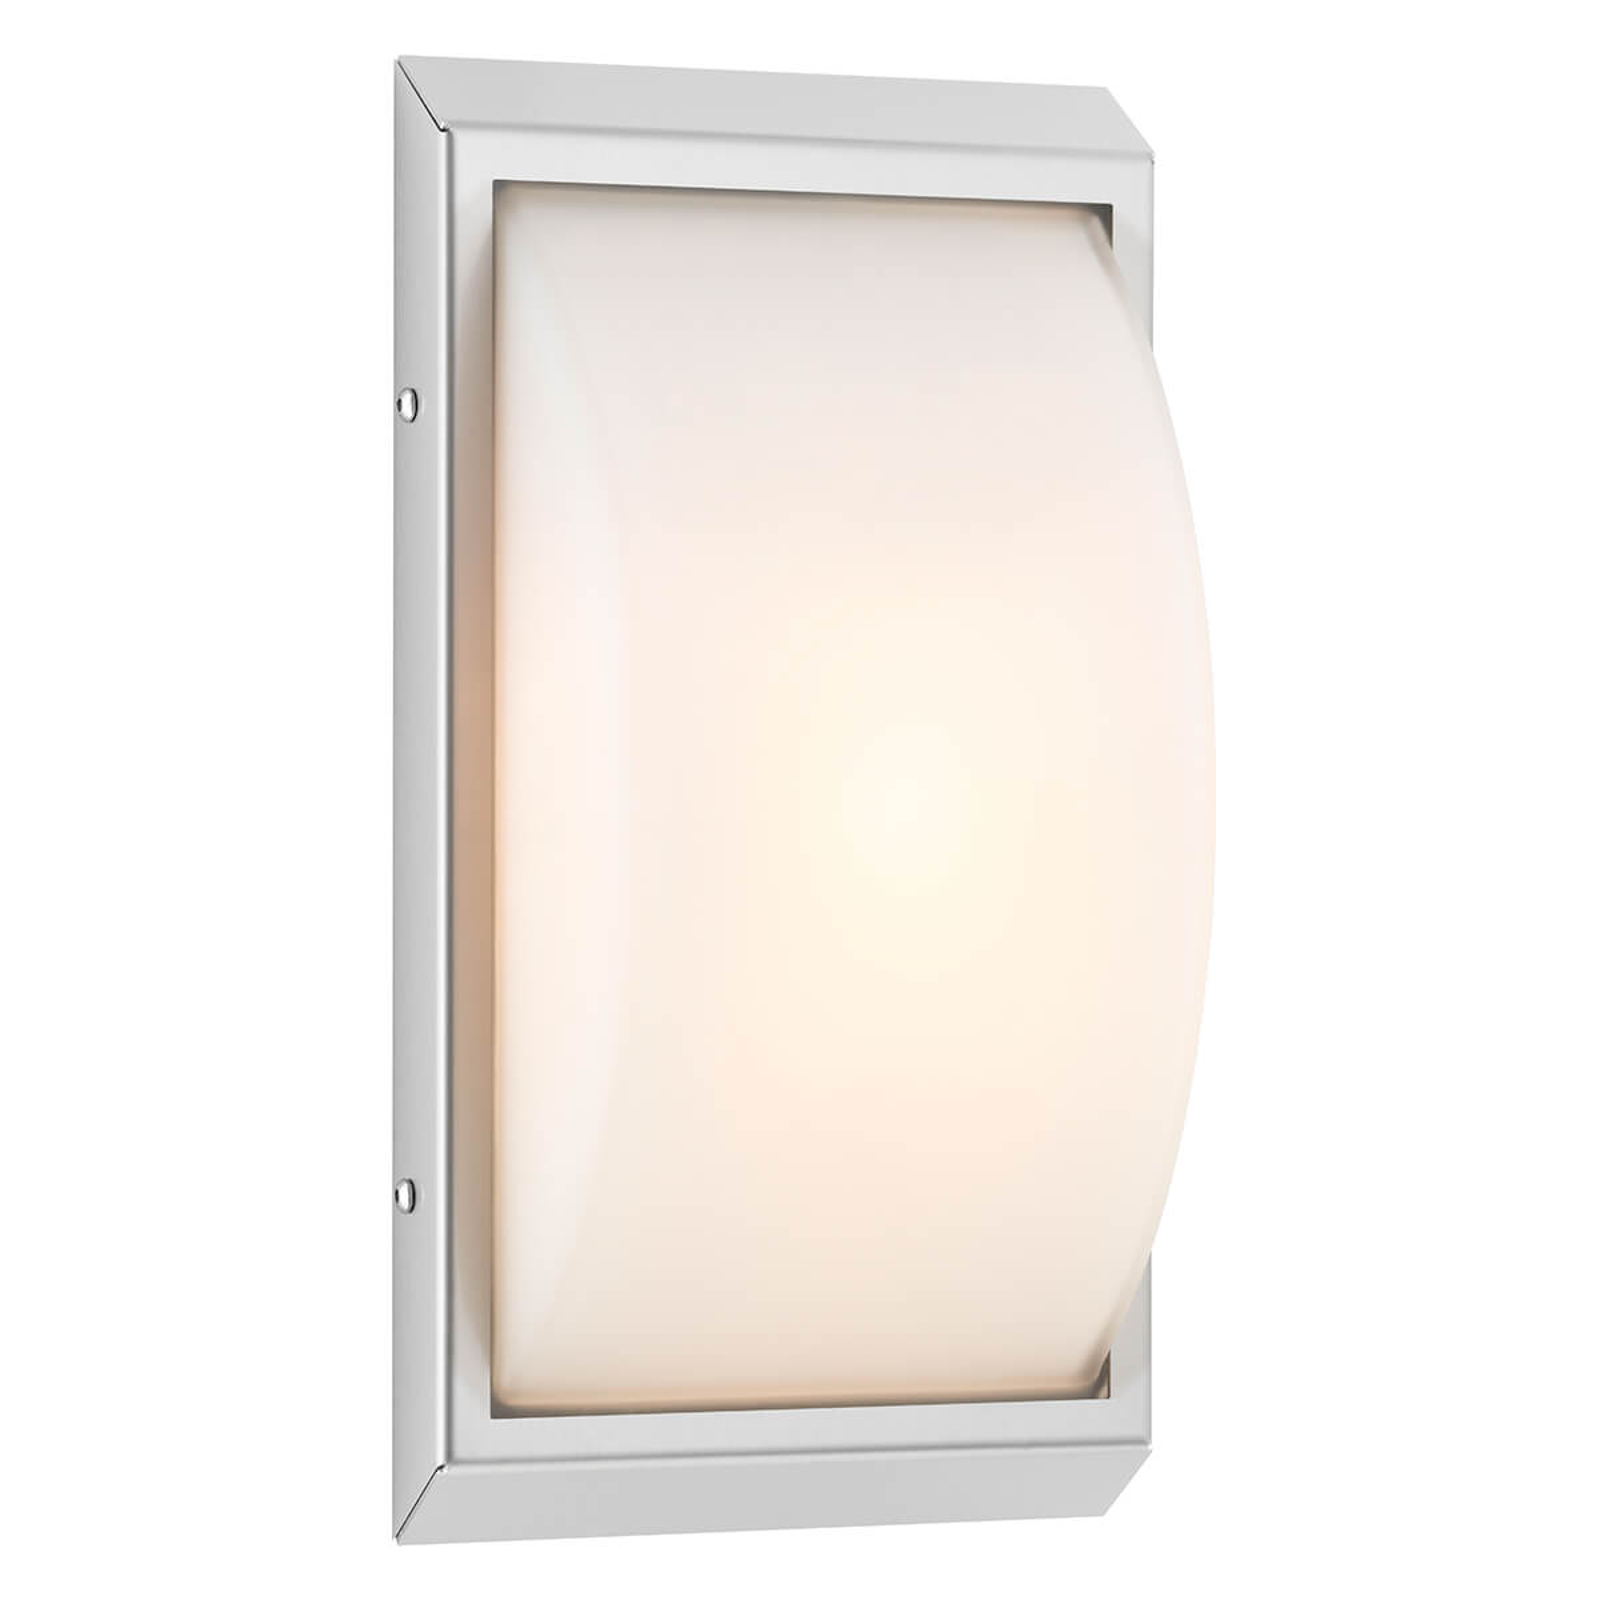 Hoogwaardige LED buitenwandlamp Malte m. sensor